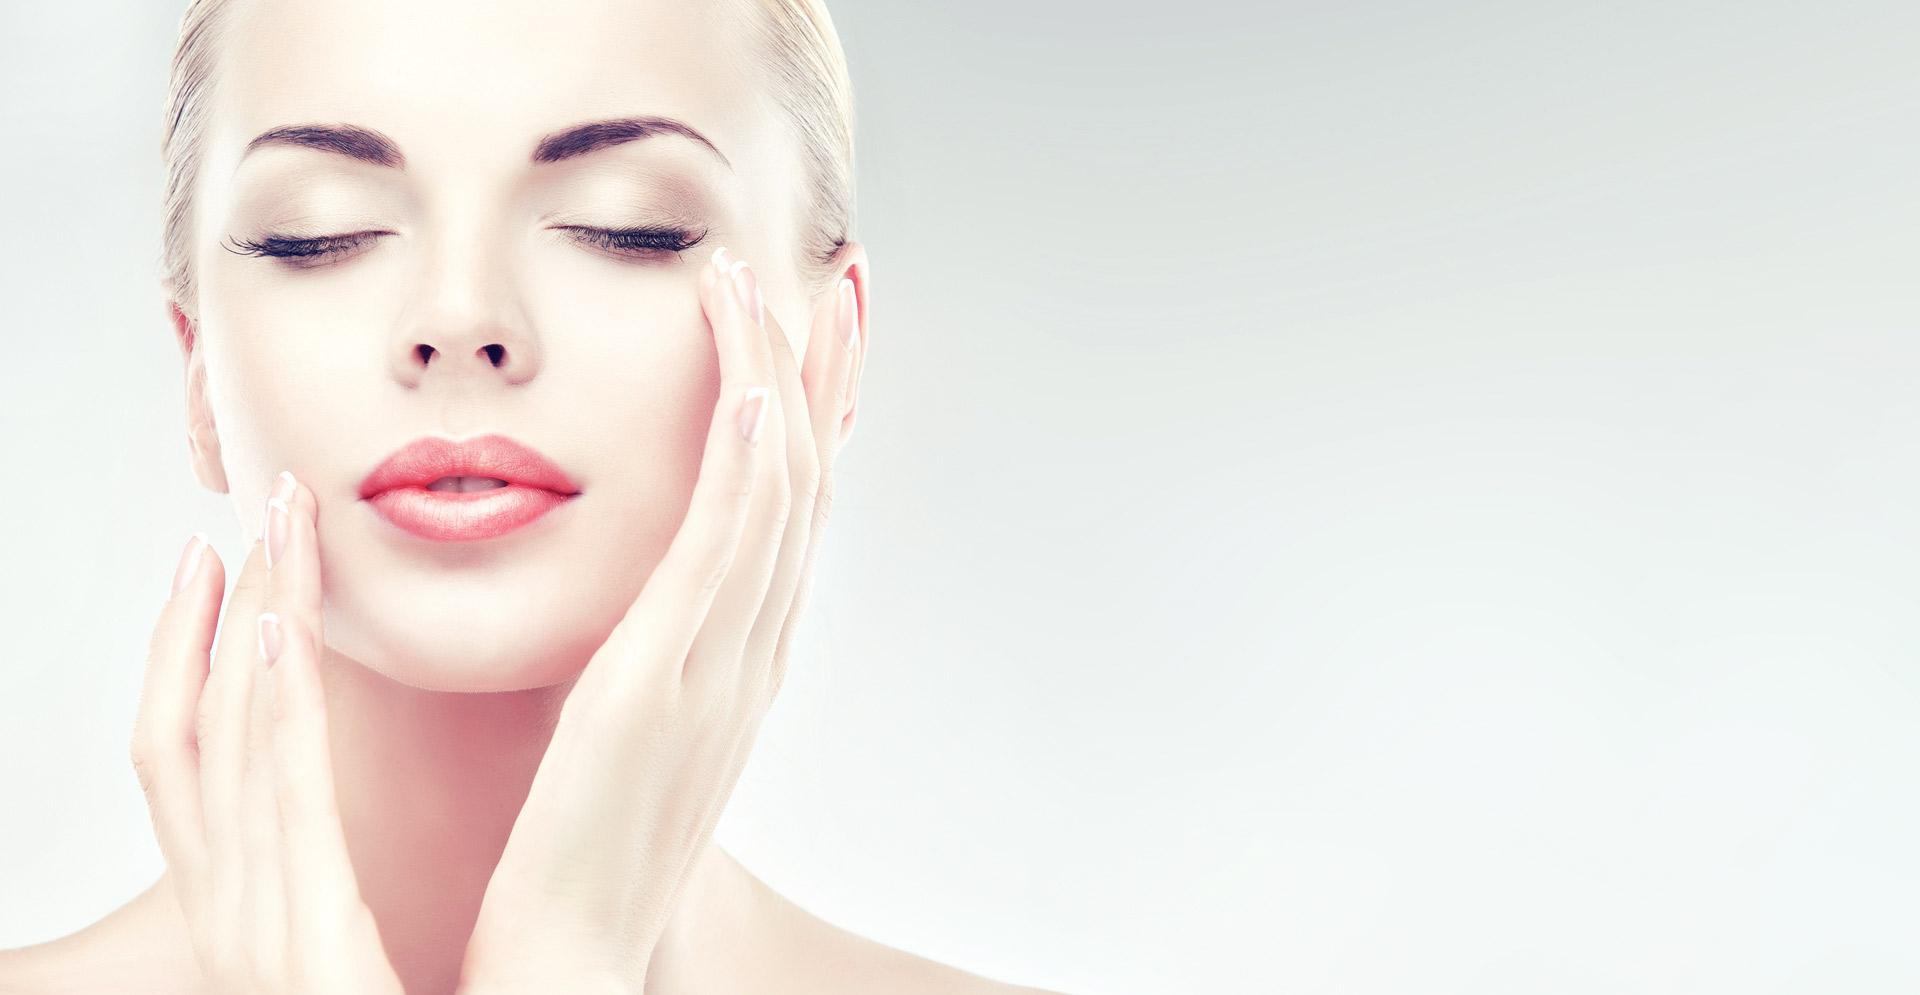 Esthetique Kosmetikstudio Dorsten